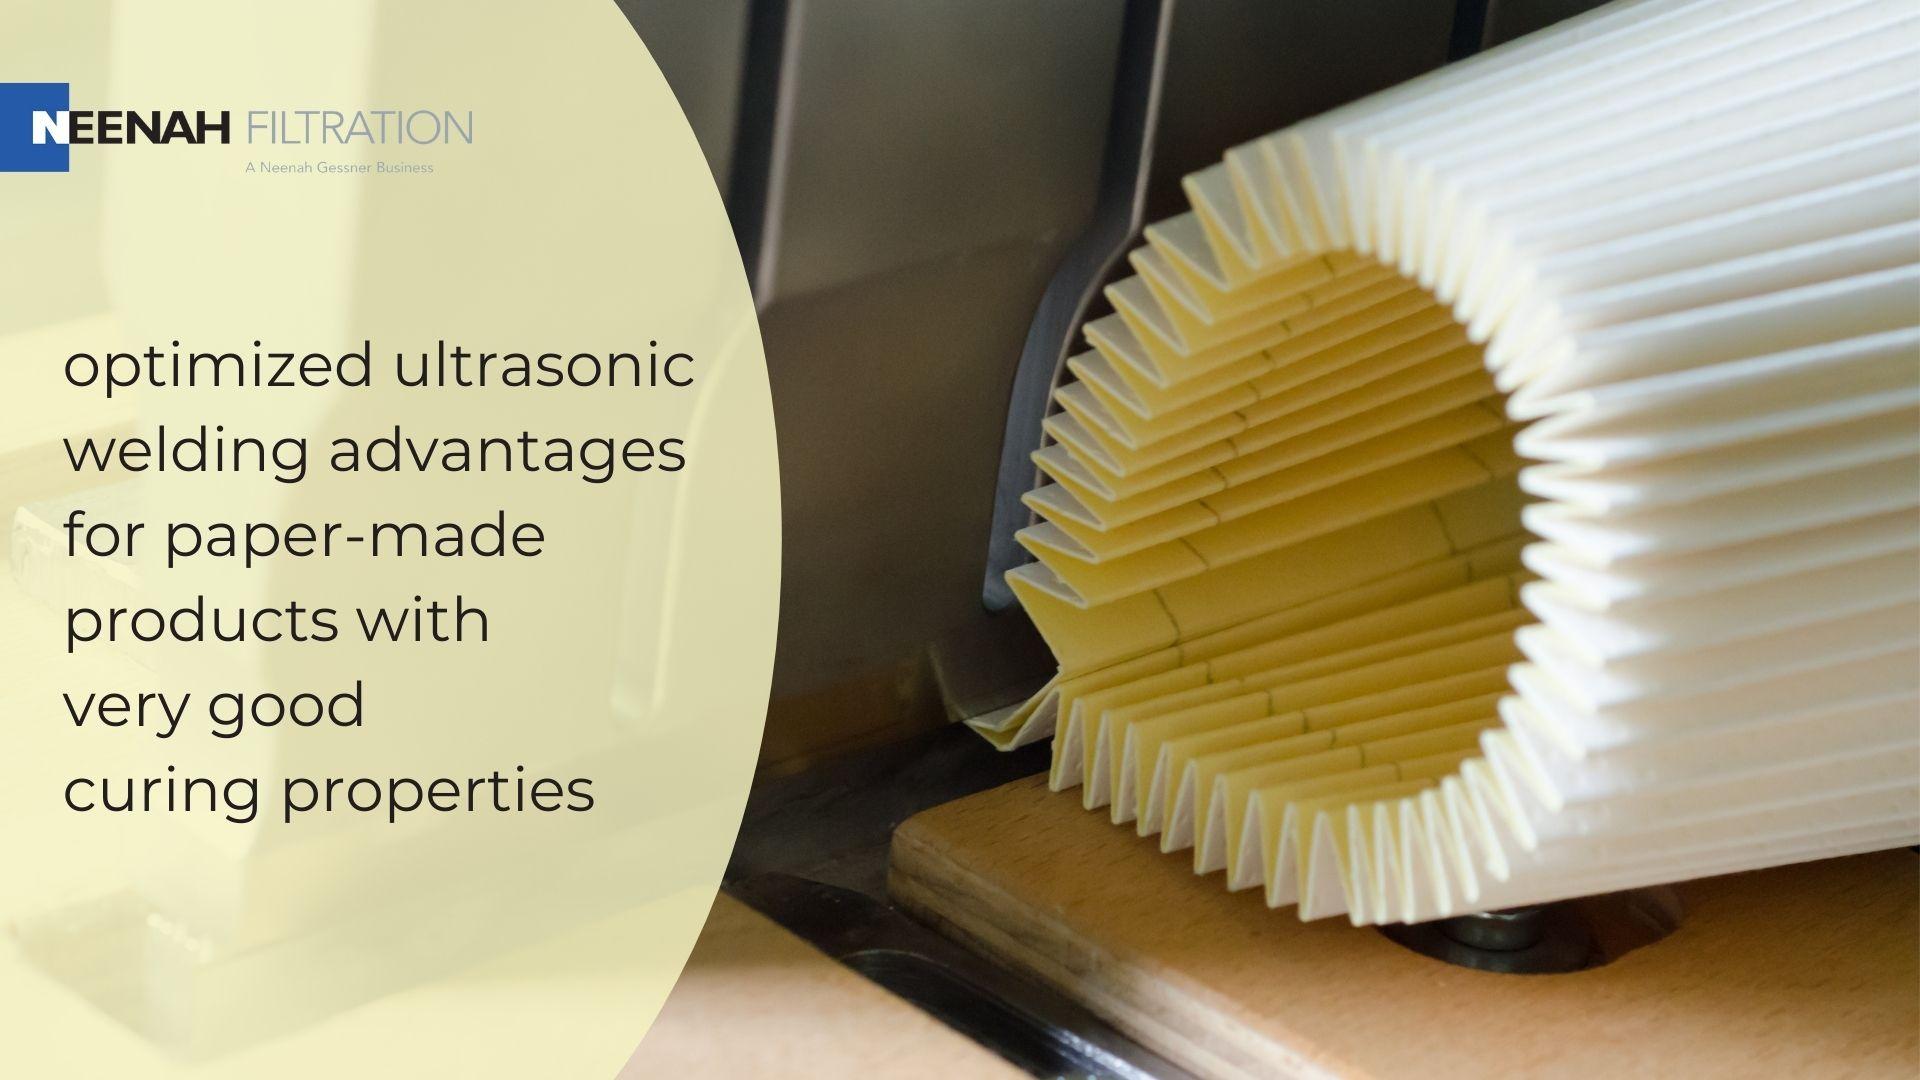 Neenah Filtration Media for Ultrasonic Welding